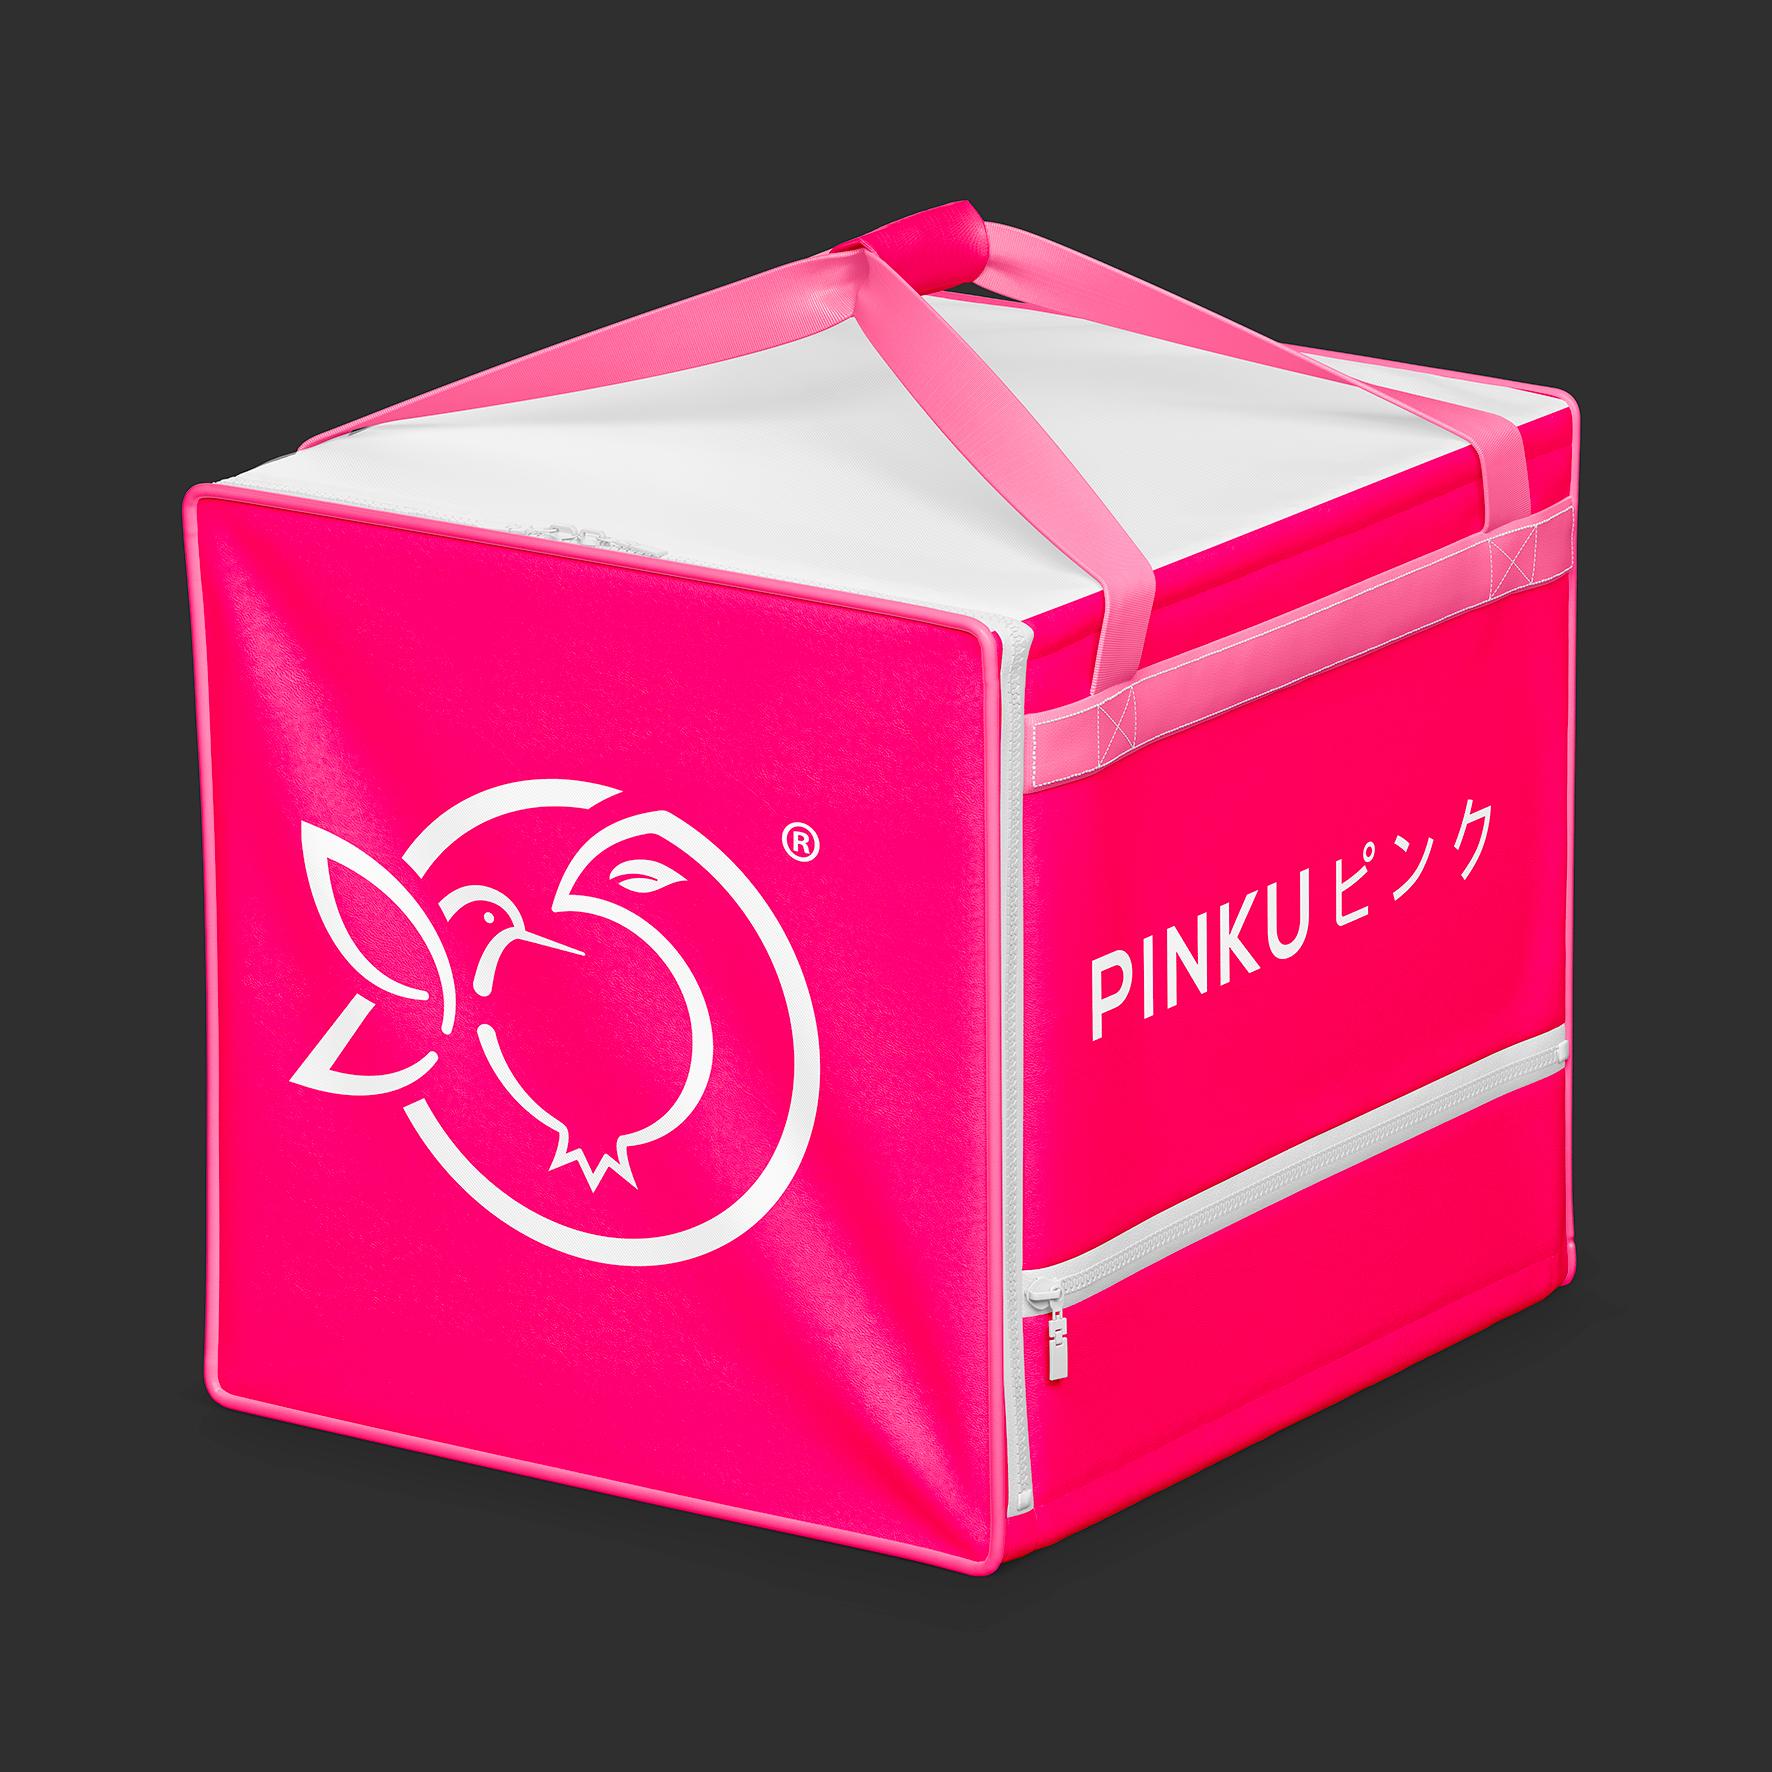 pinku-7